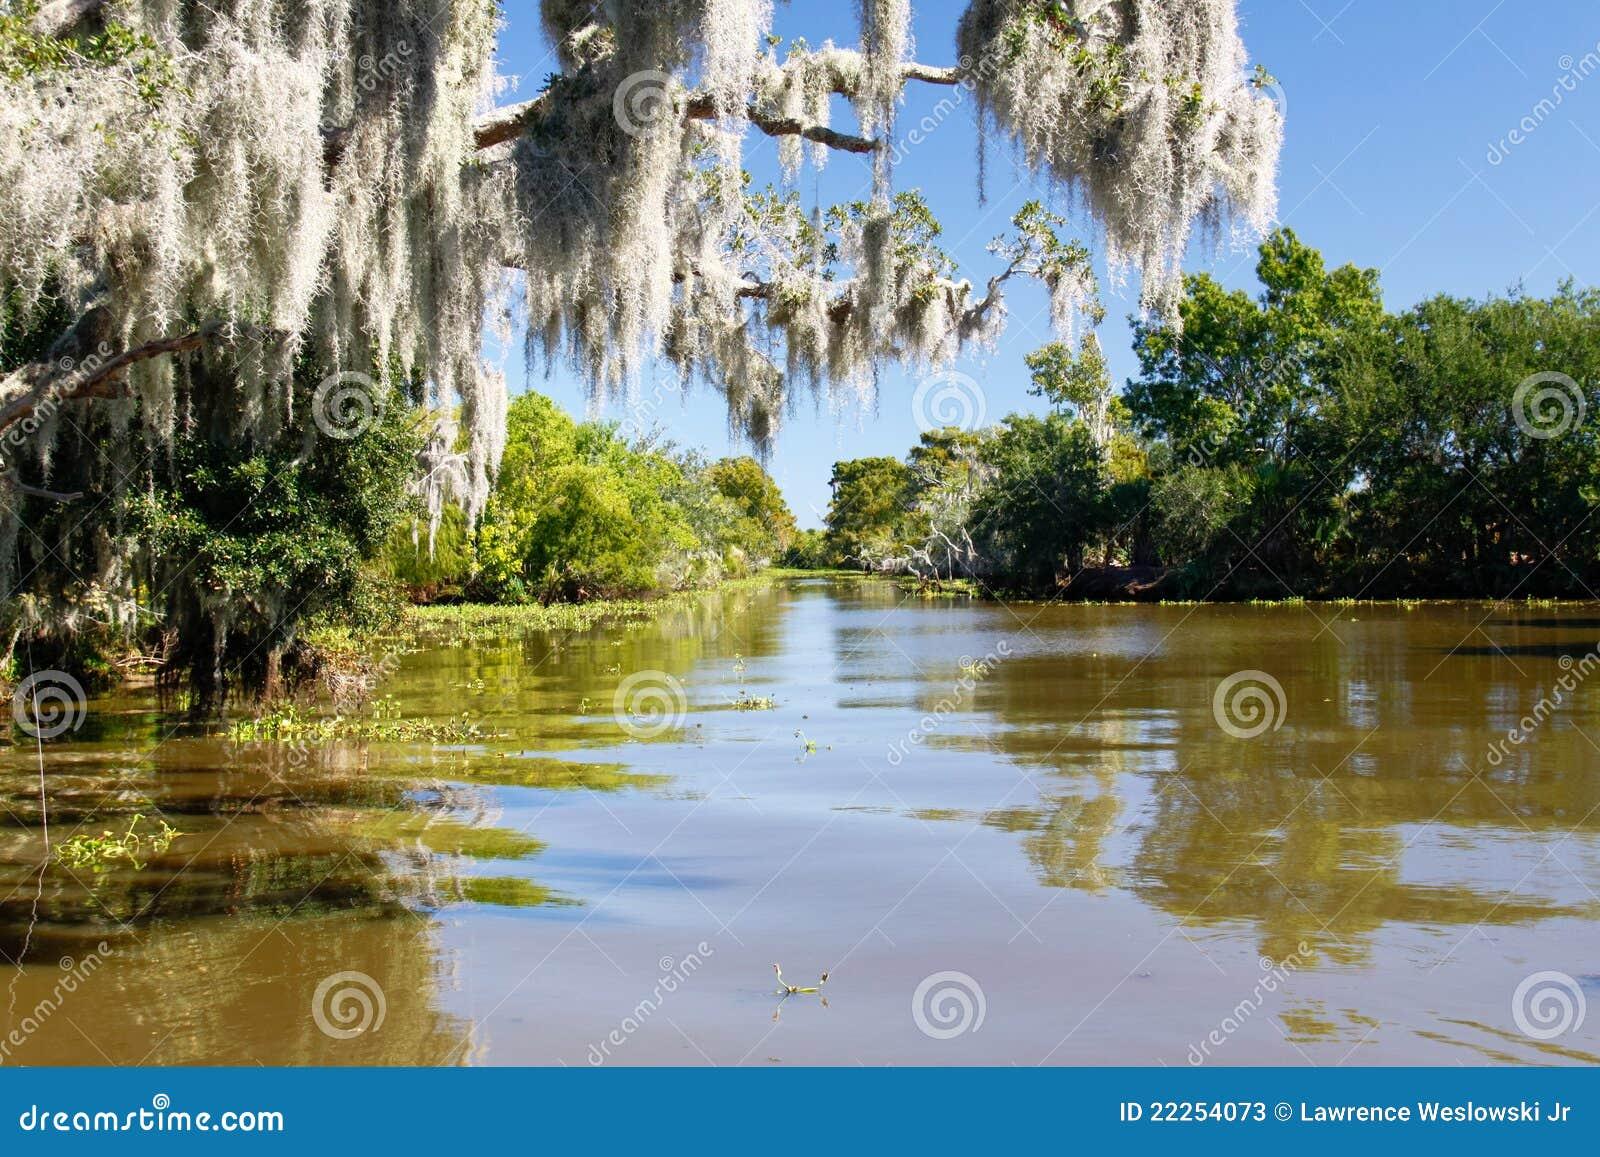 Bayou and Spanish Moss